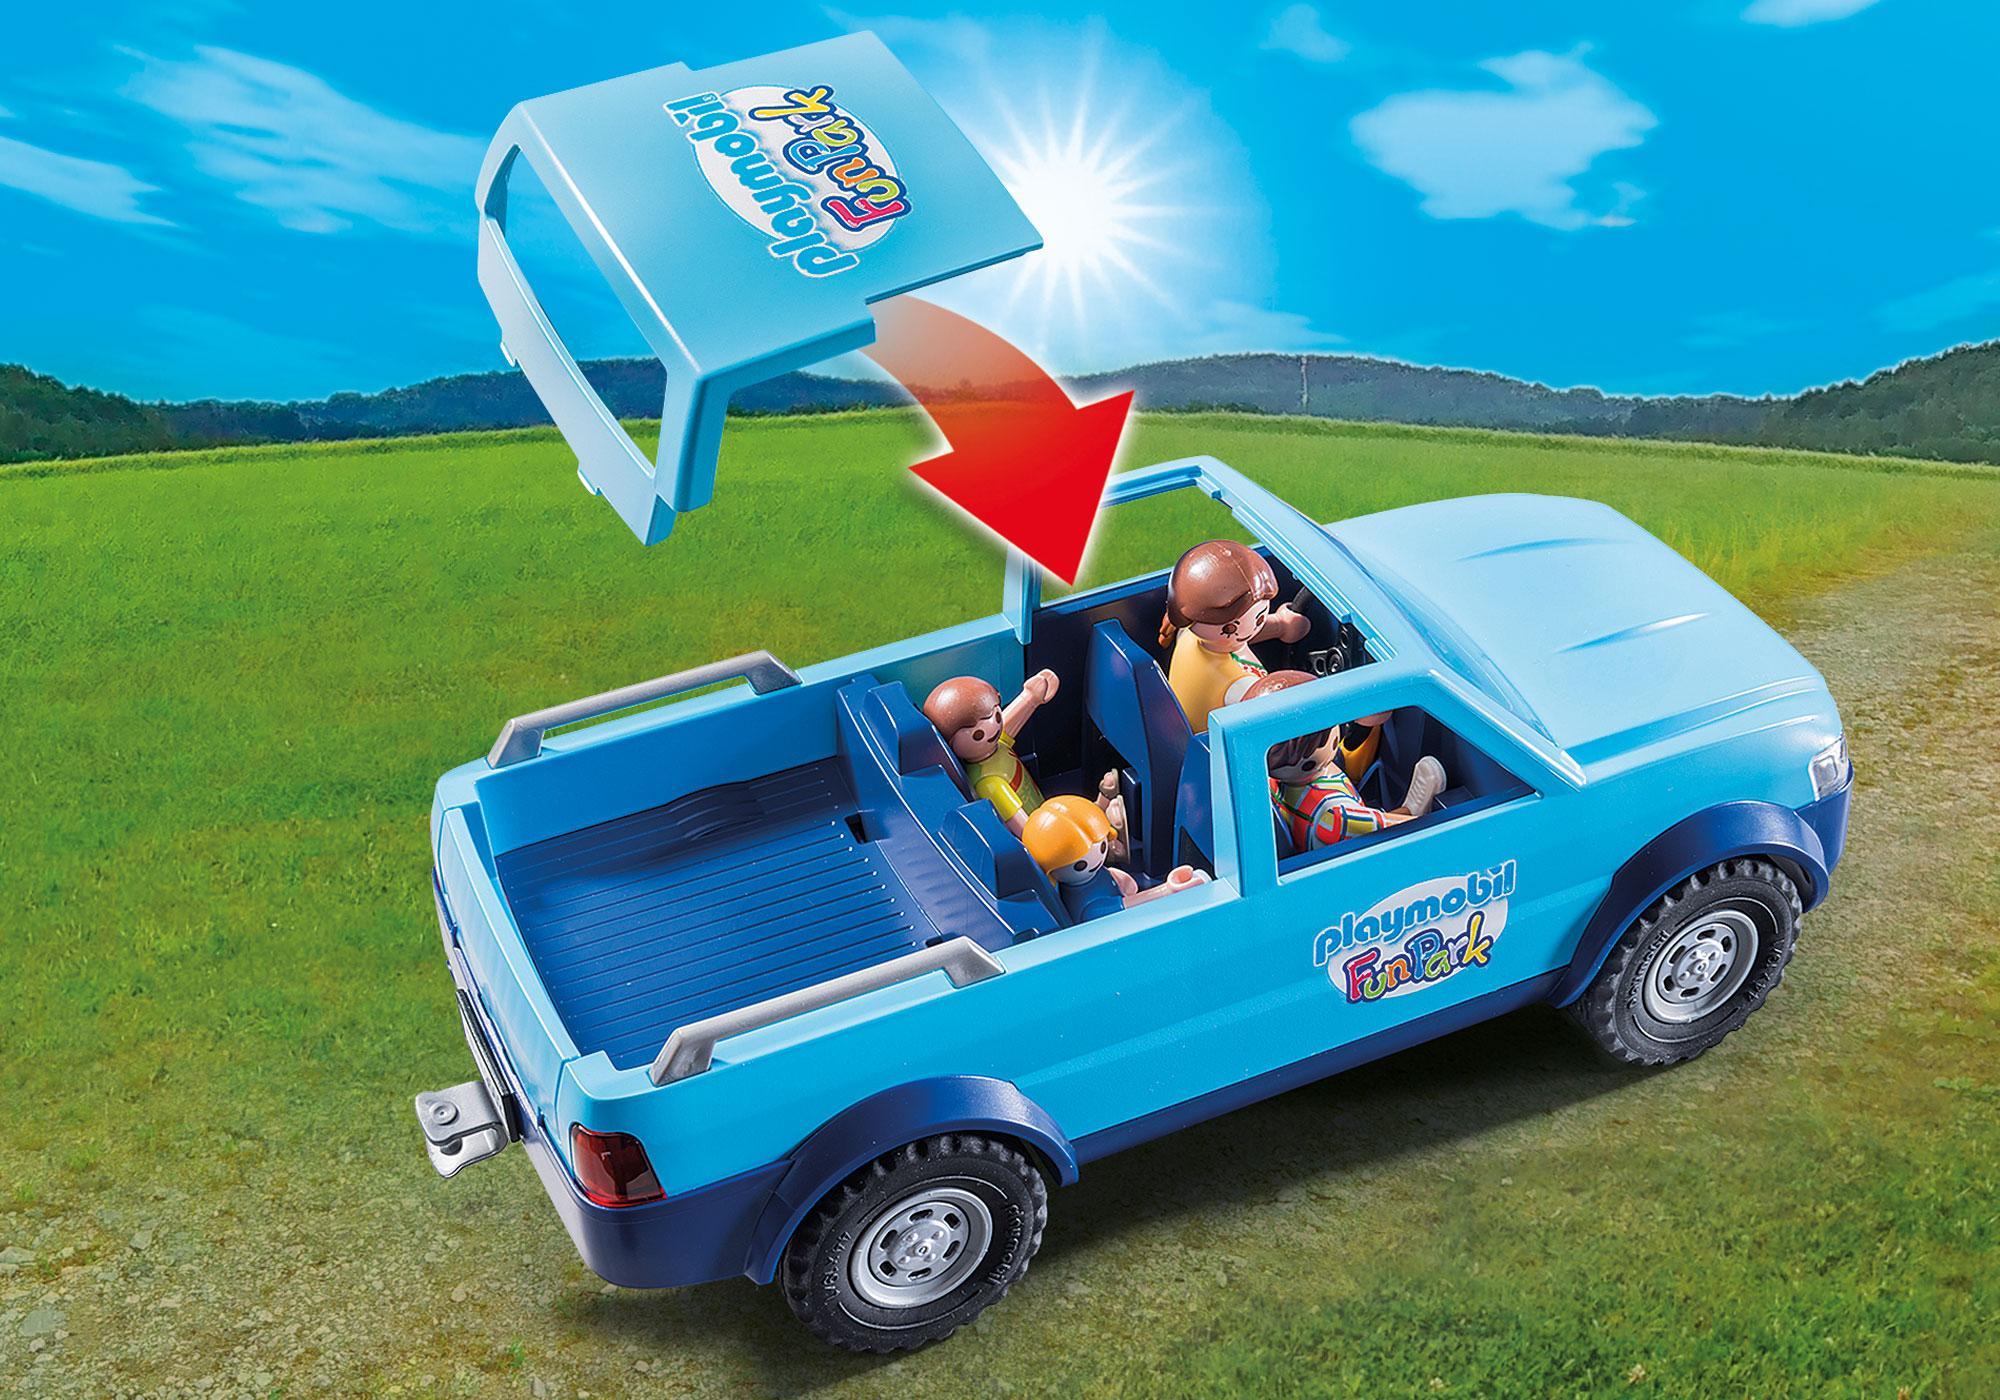 http://media.playmobil.com/i/playmobil/9502_product_extra1/PLAYMOBIL-FunPark Pickup com Trailer